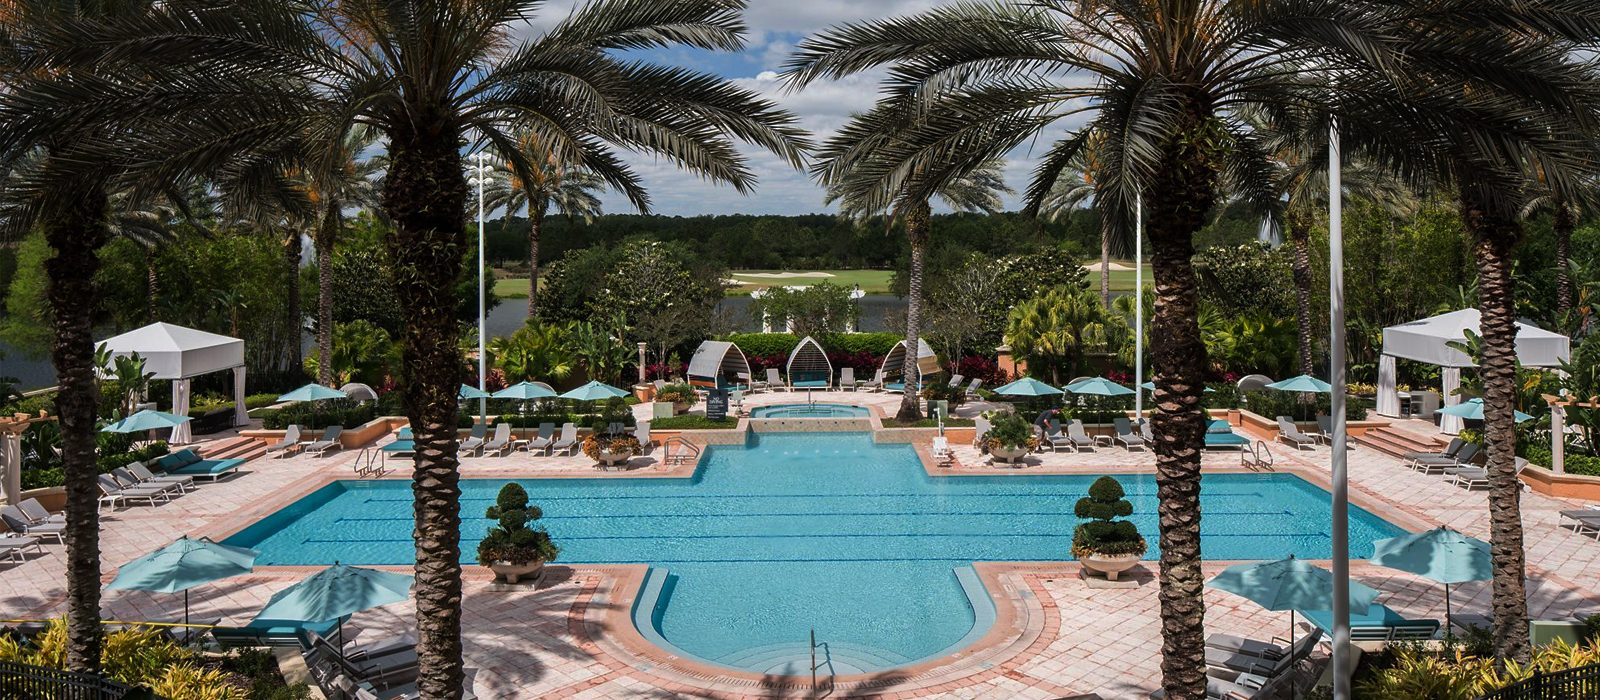 Luxury Orlando Holidays The Ritz–Carlton Orlando, Grande Lakes Header